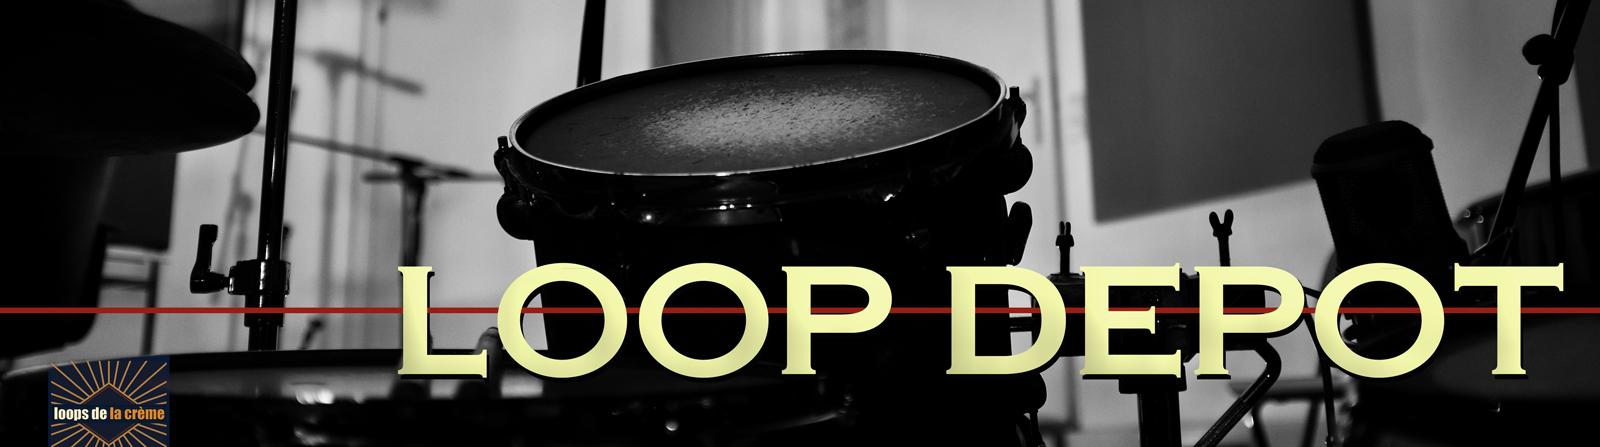 the loop depot - free loops, beats, loop collections and construction kits